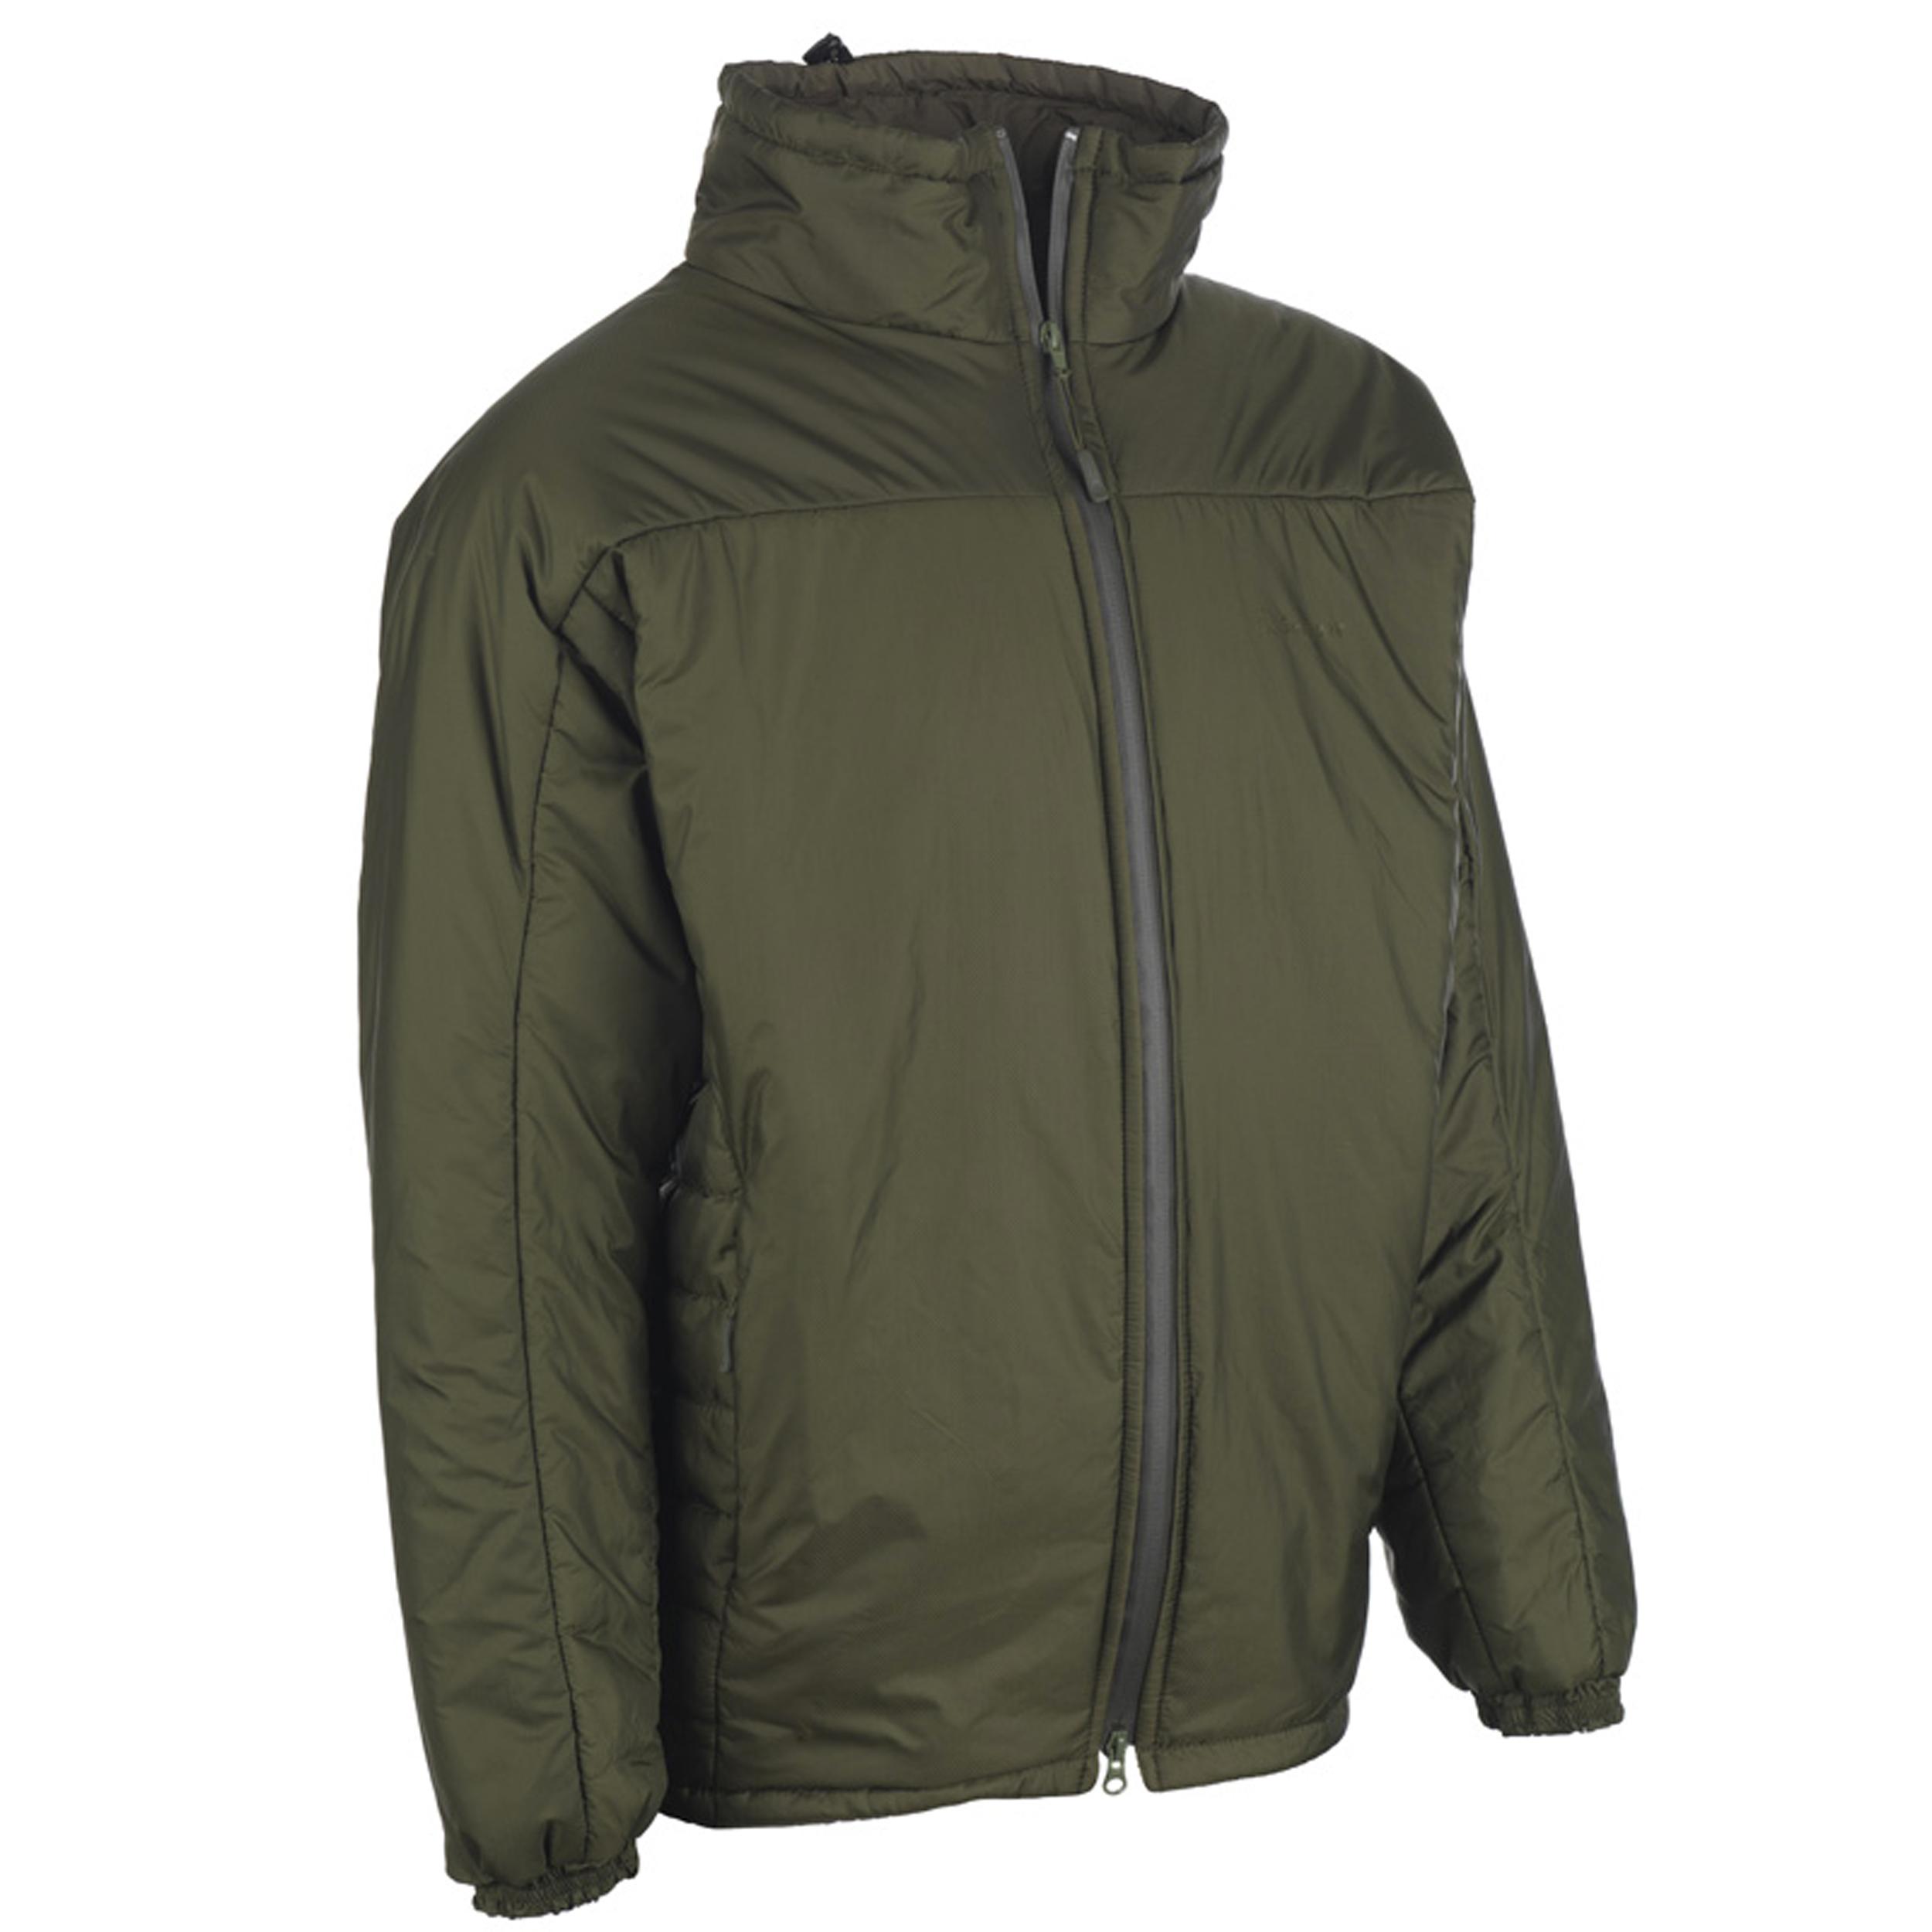 Snugpak Sj6 Jacket Olive Lg